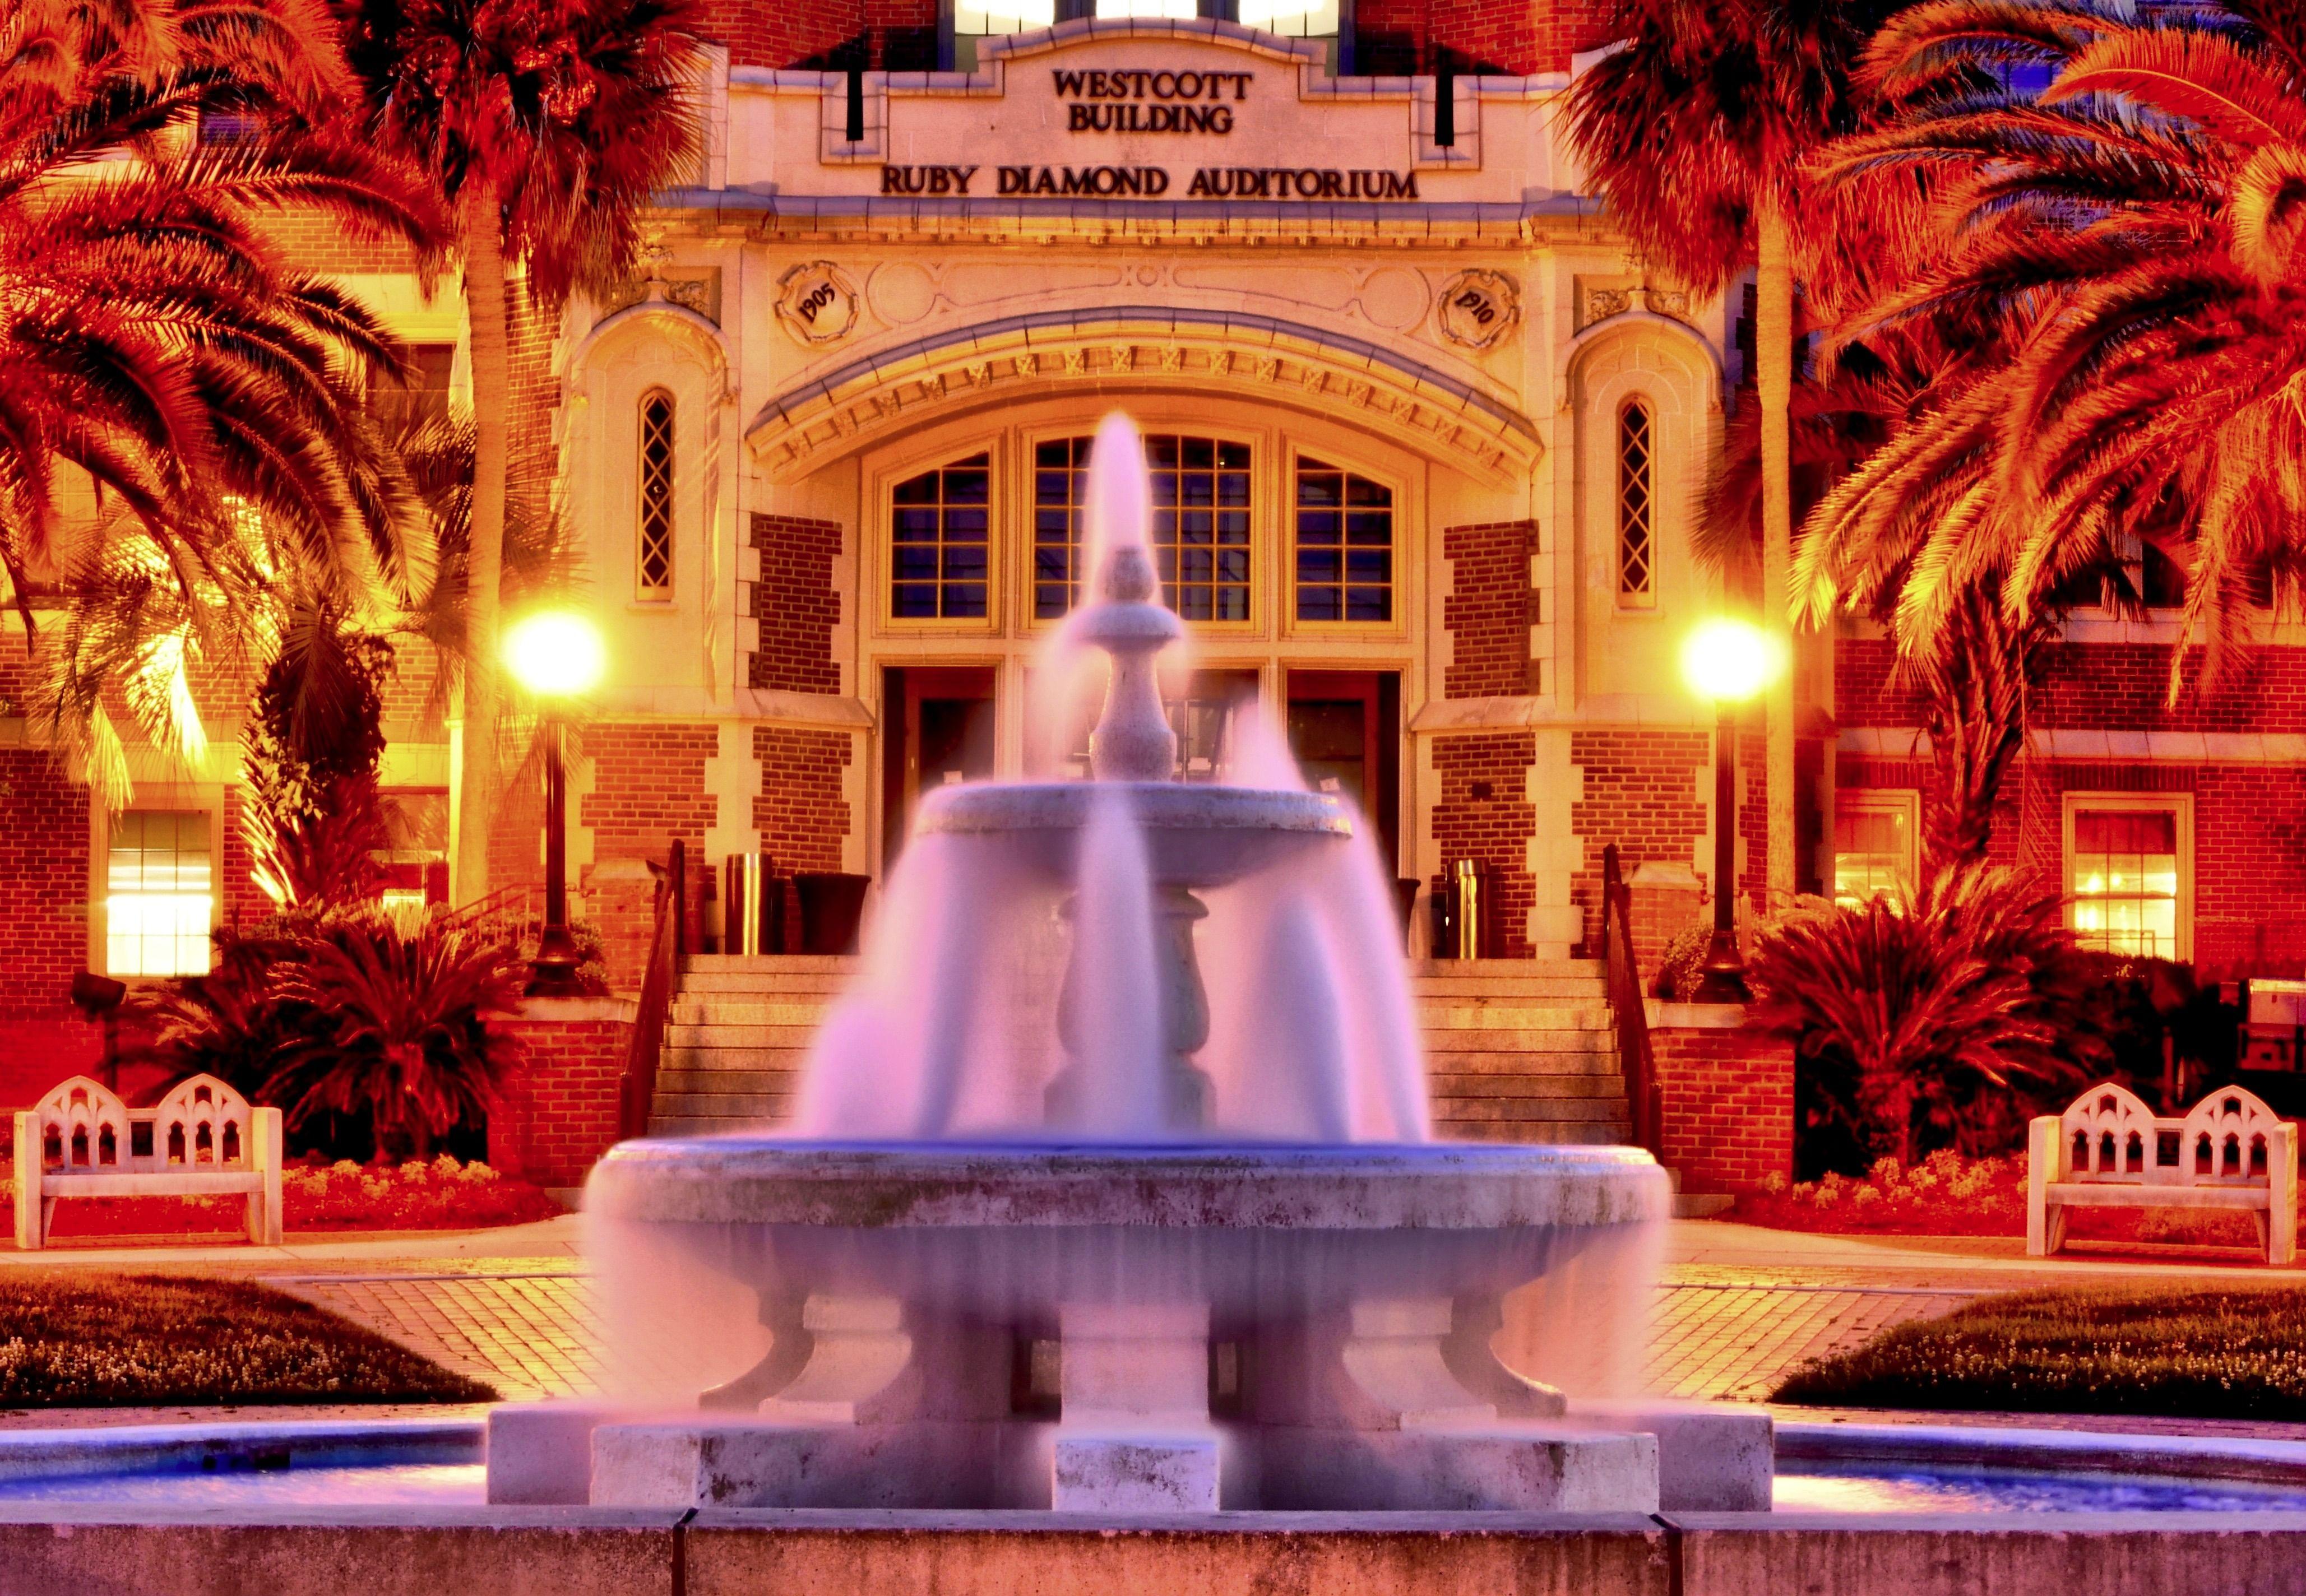 The Westcott Building and Ruby Diamond Auditorium at Florida State University.